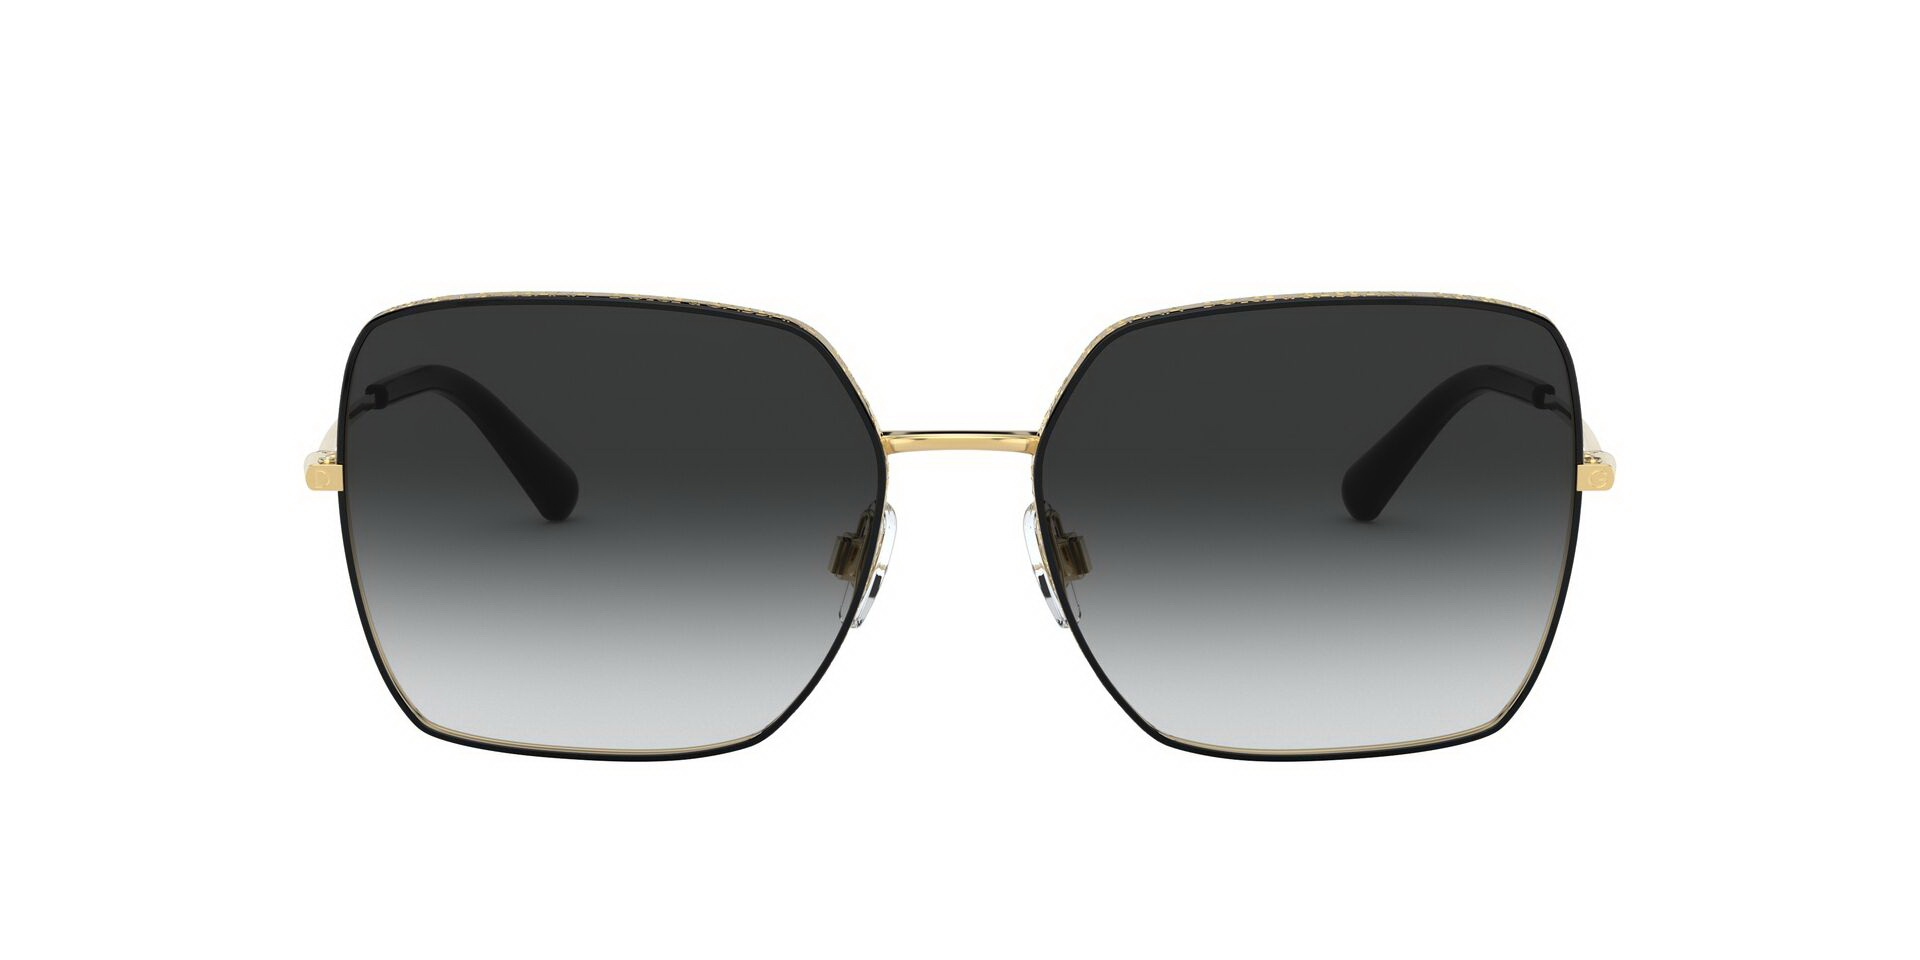 Солнцезащитные очки Очки с/з DOLCE&GABBANA 0DG2242 13348G фото